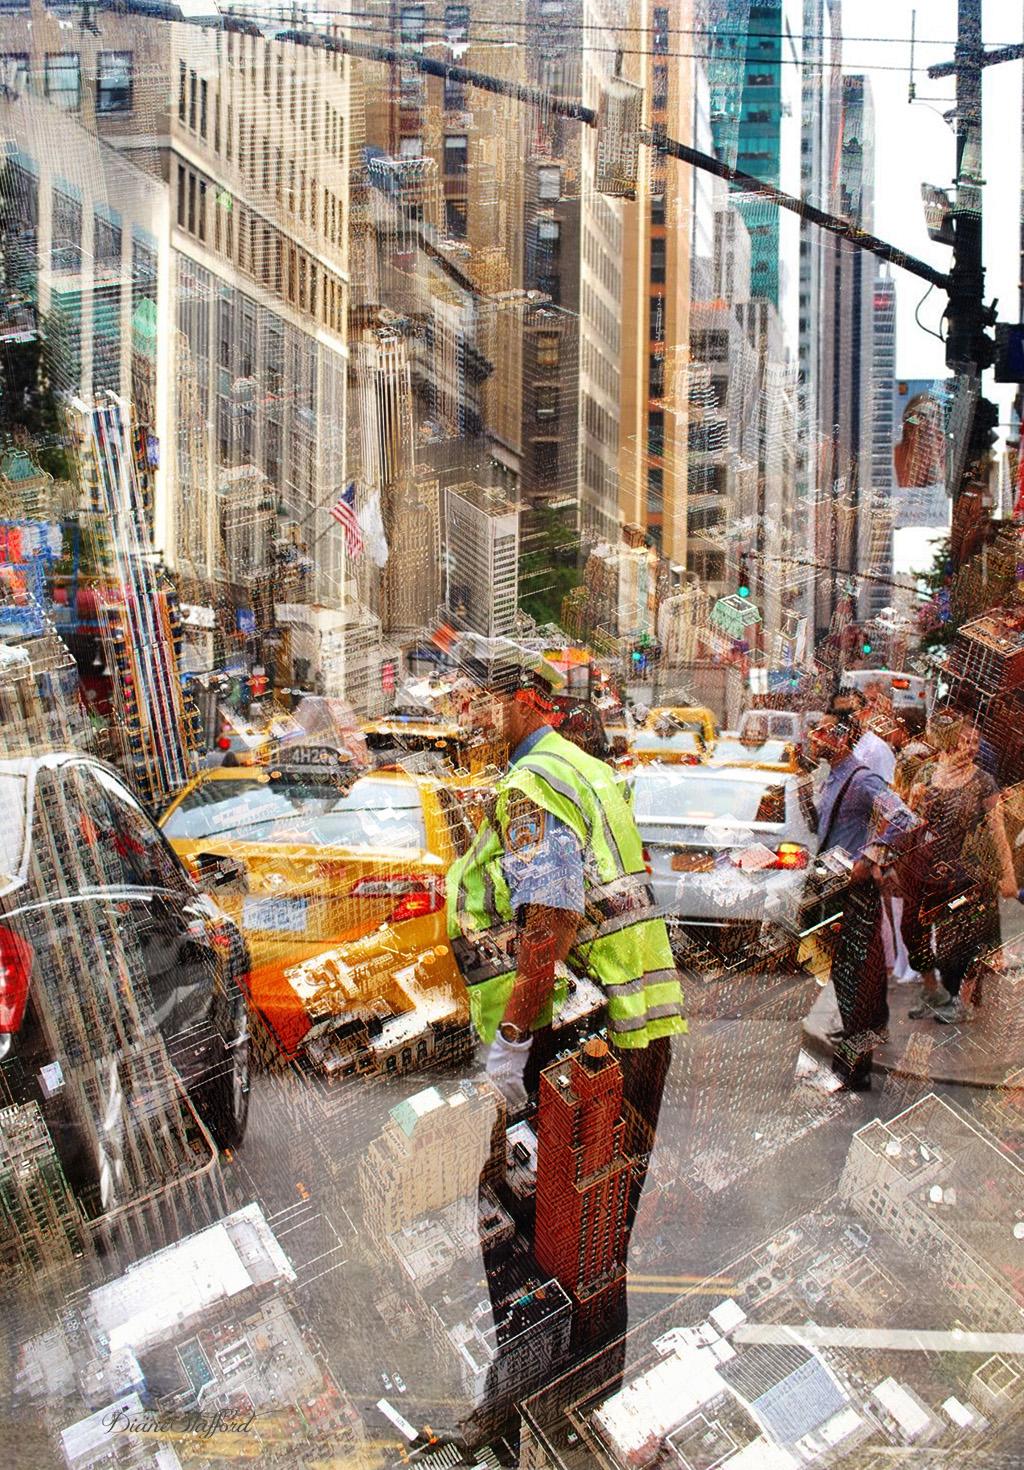 New York City Scape Diane Stafford